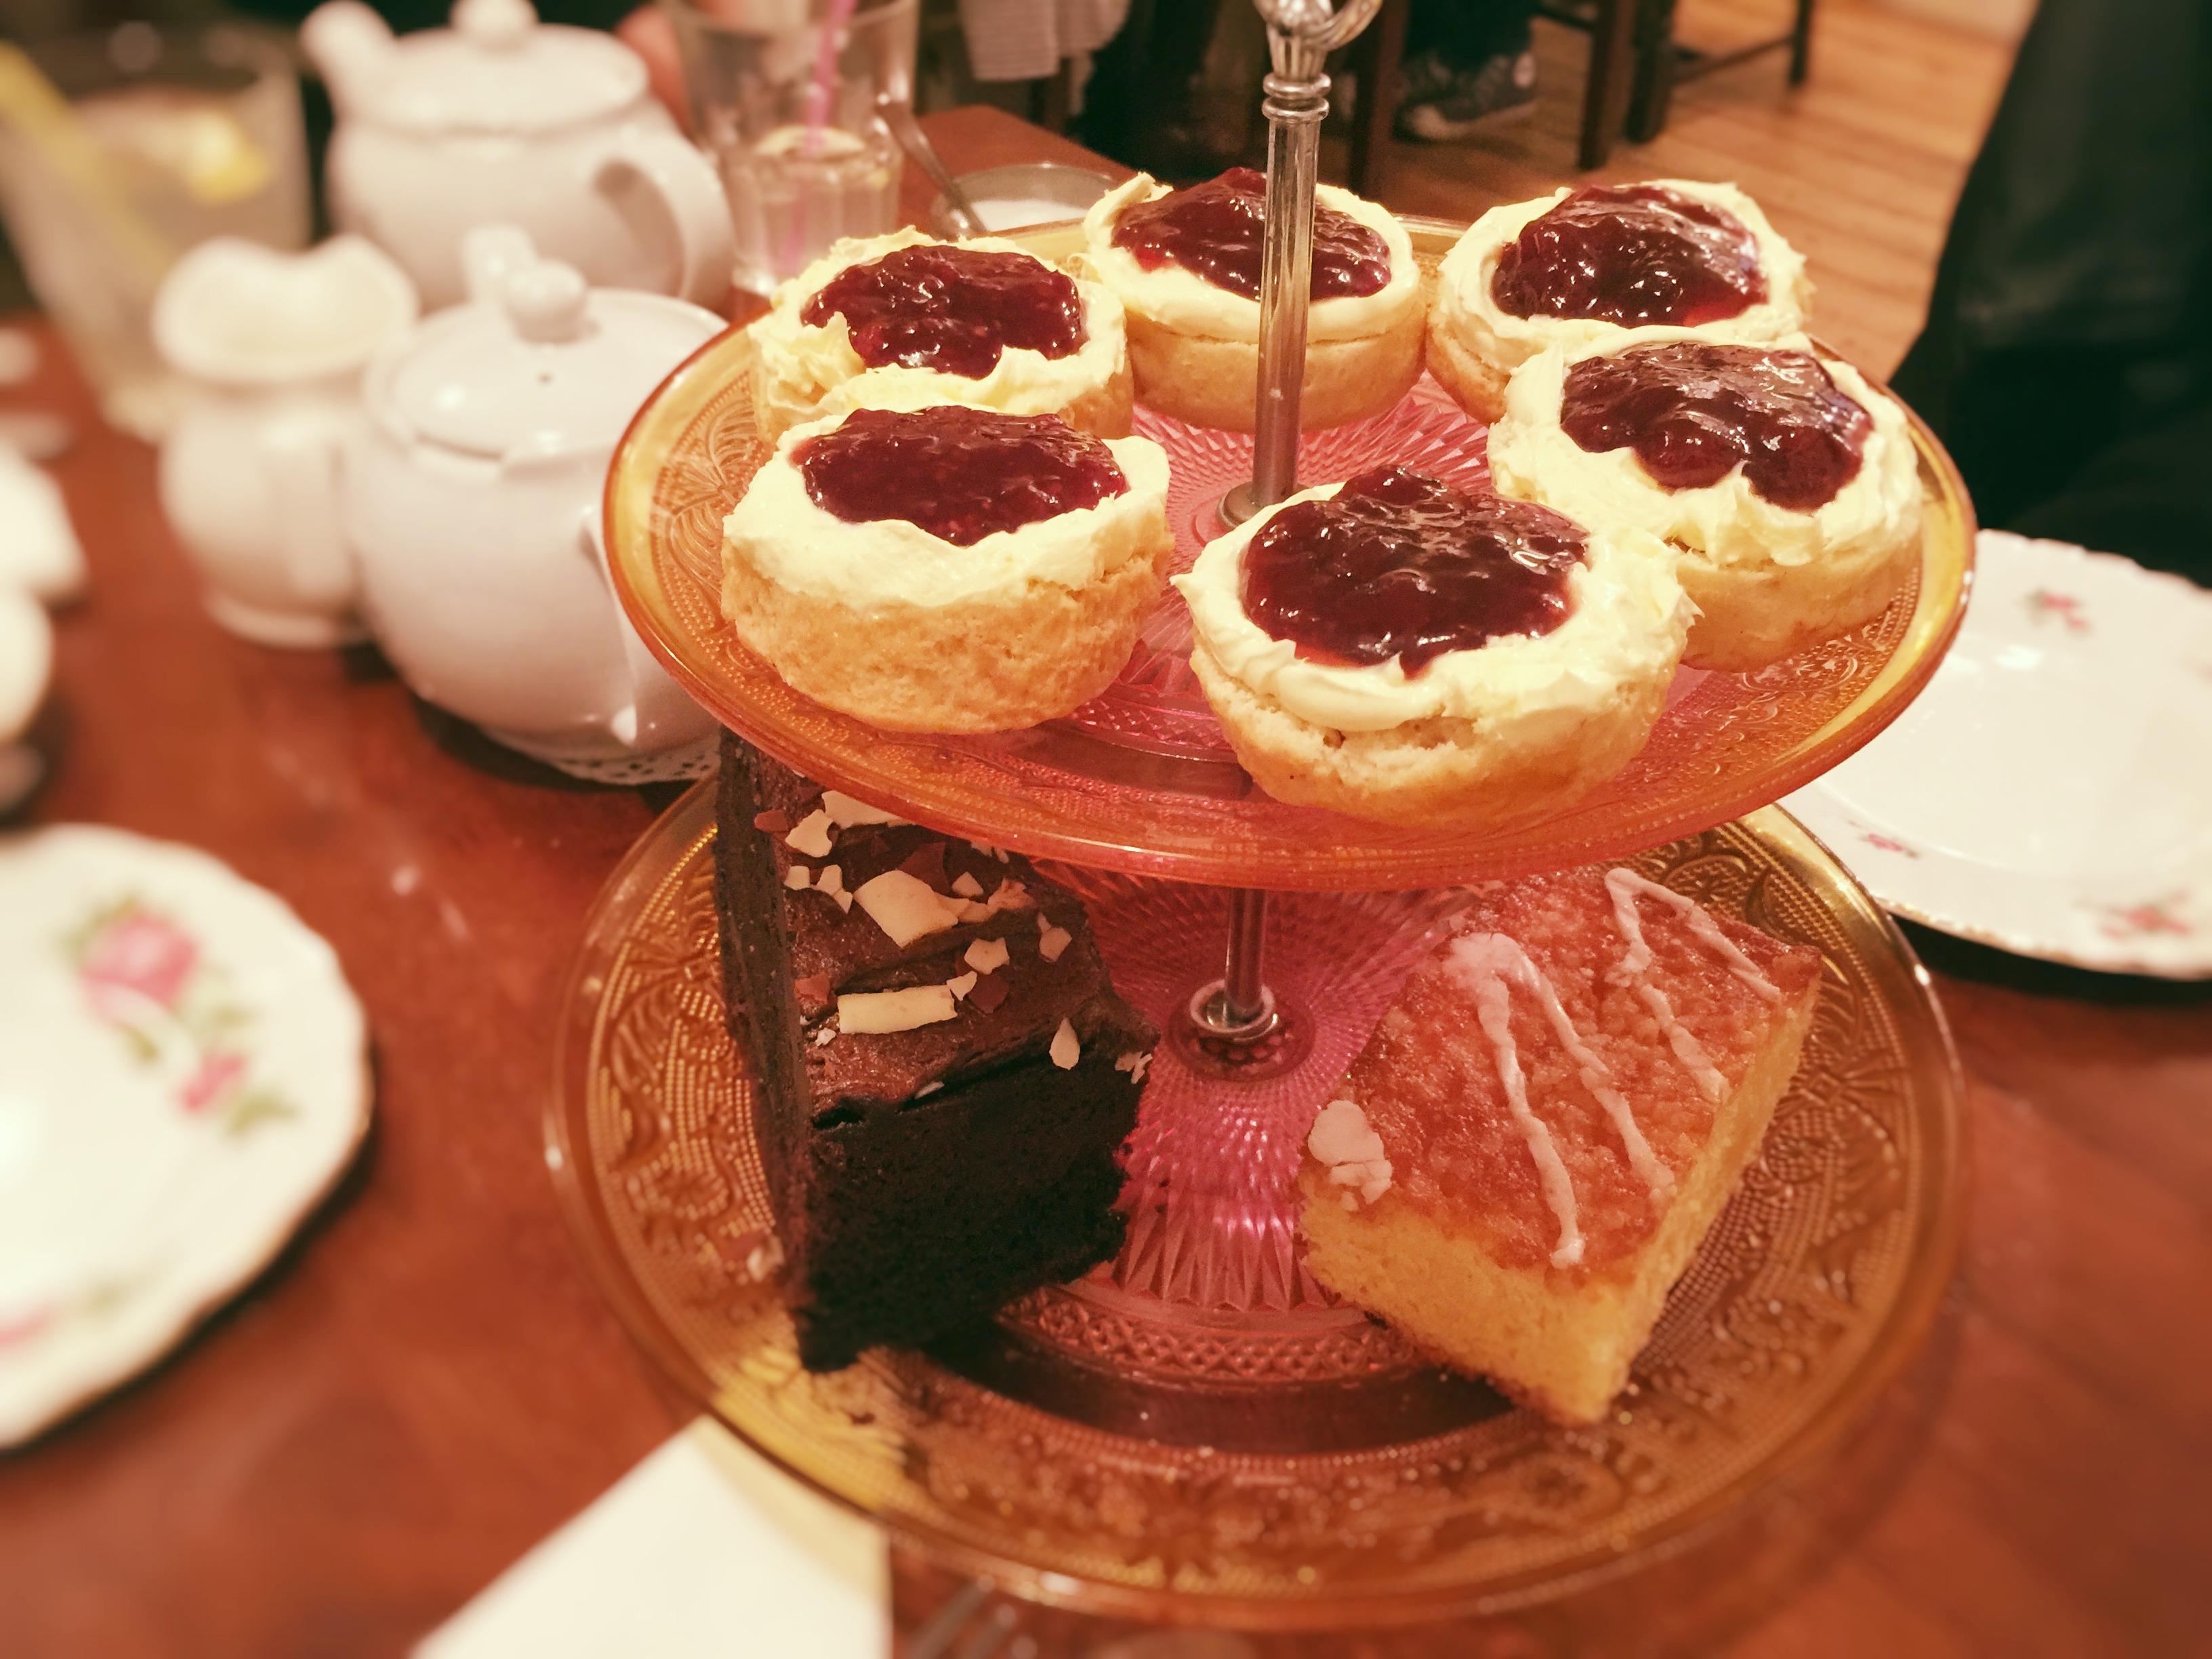 scones-and-cakes